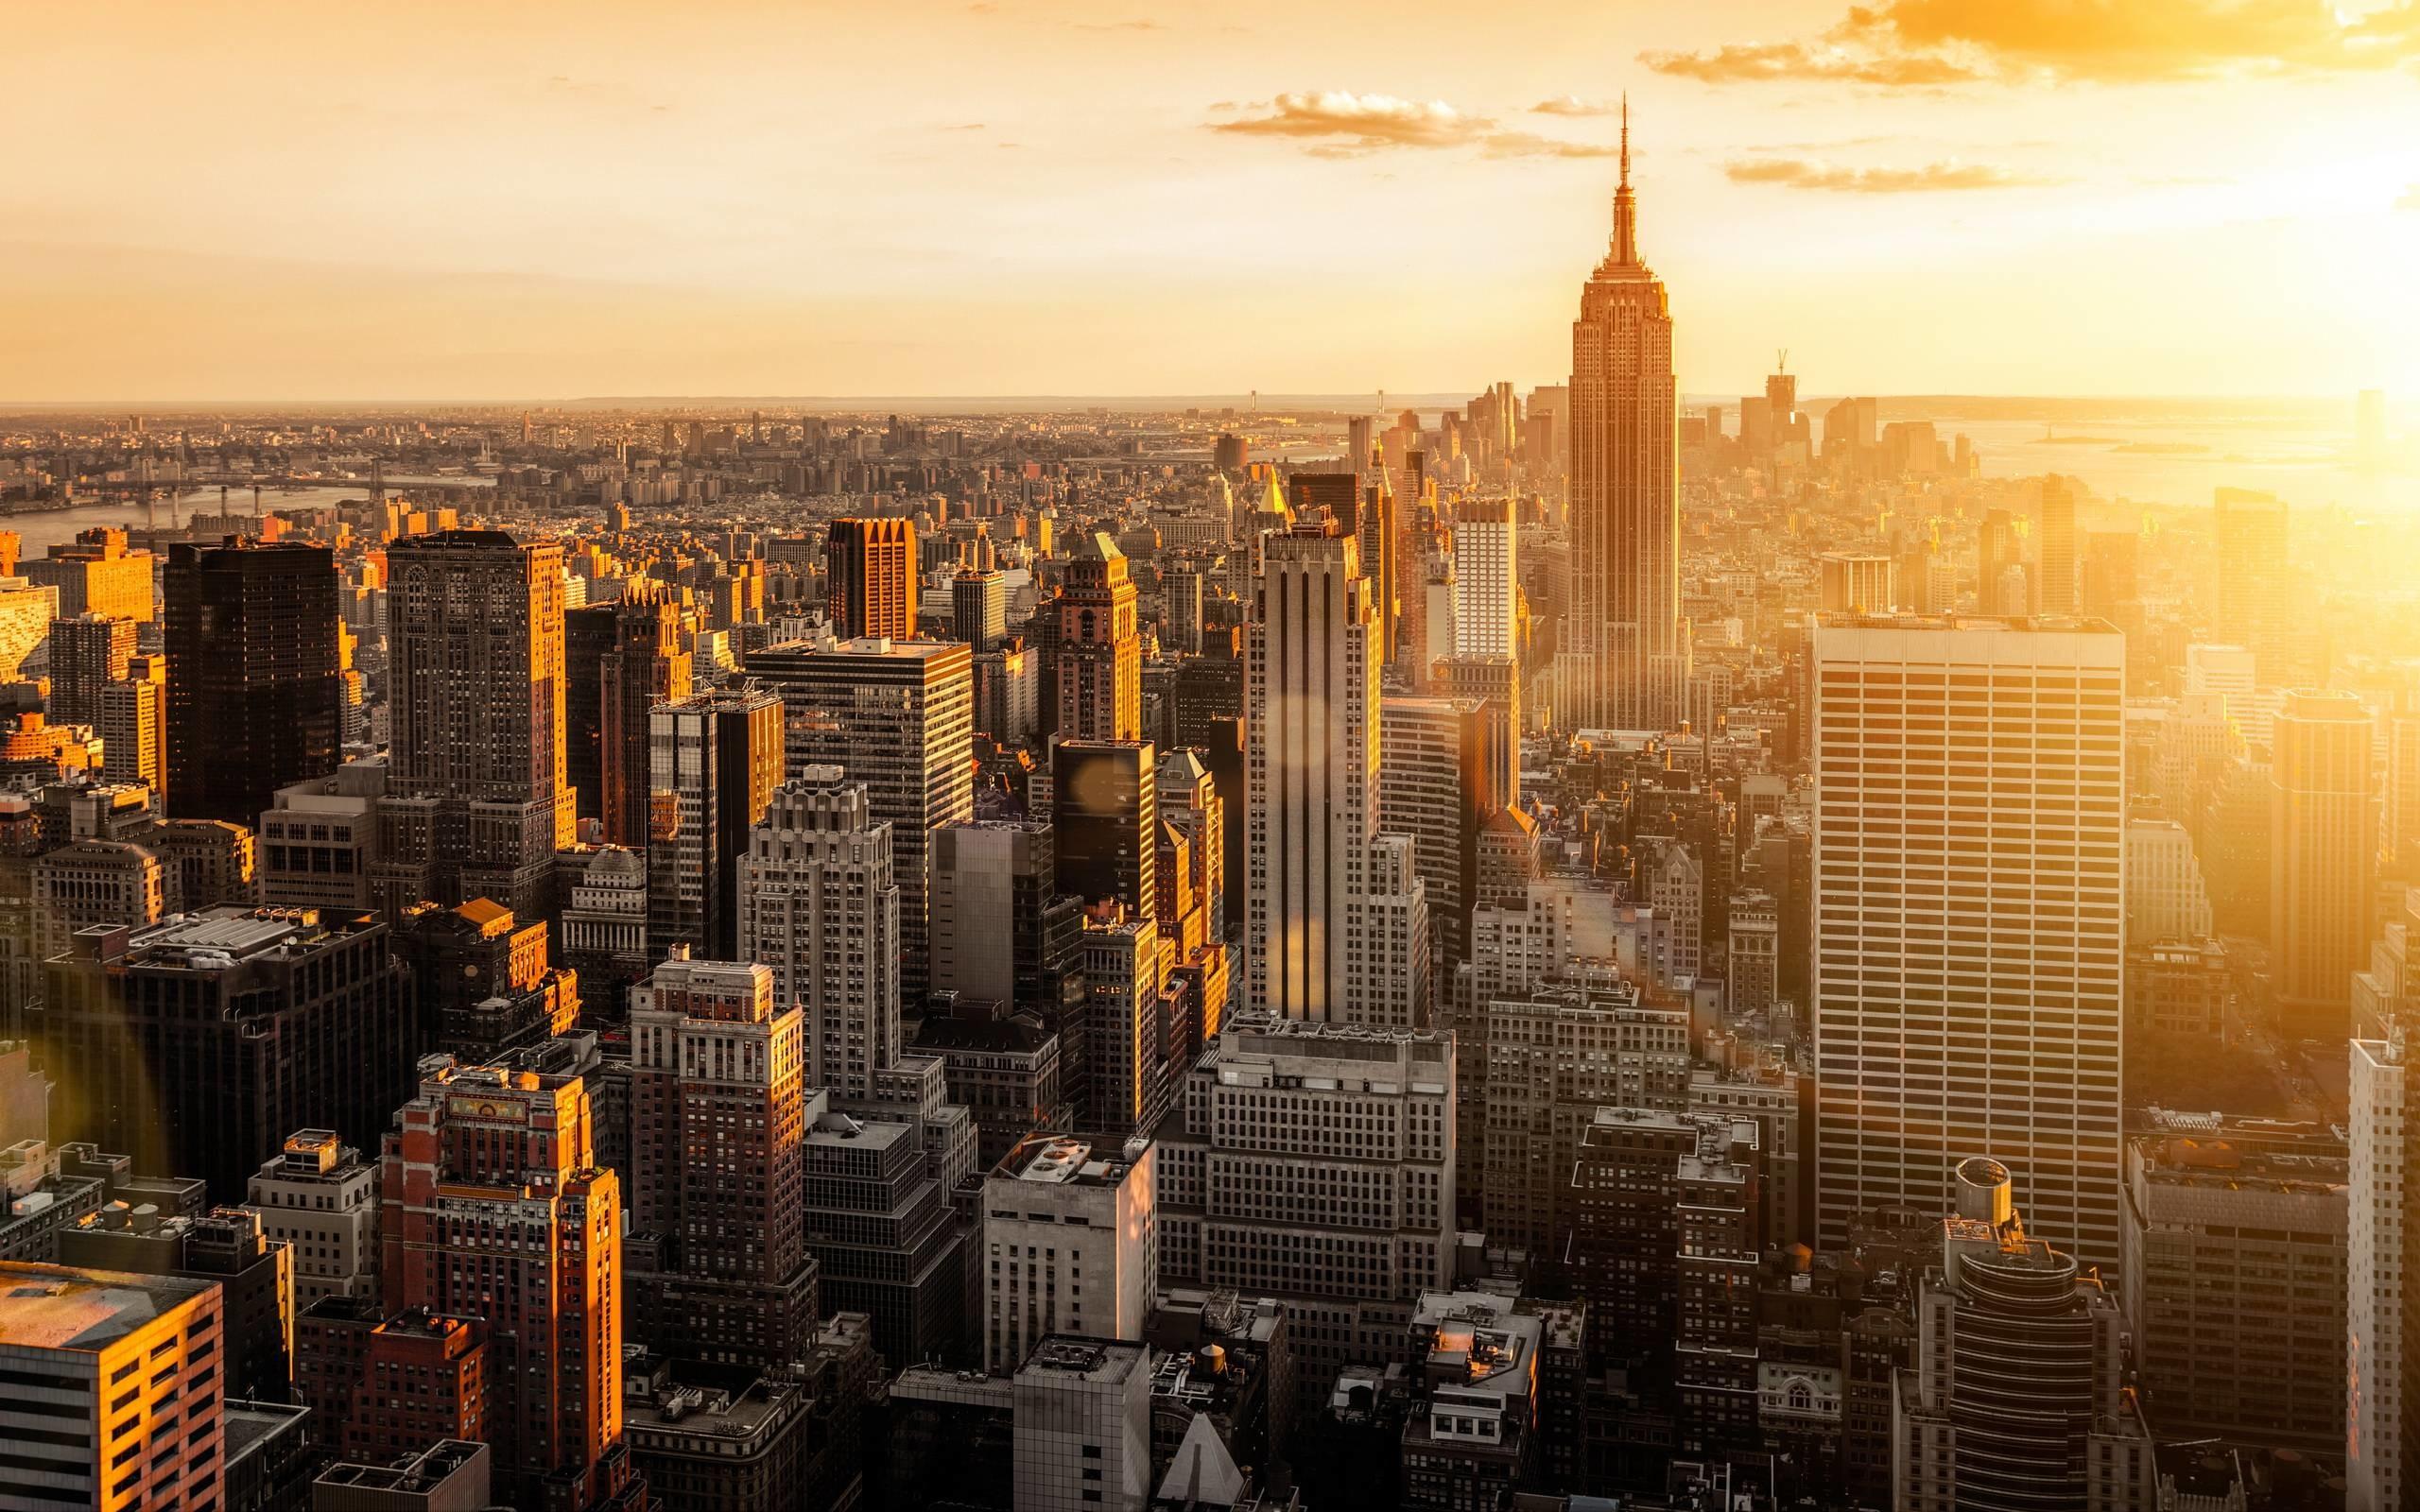 Times Square Iphone 6 Wallpaper Die 69 Besten New York Wallpapers